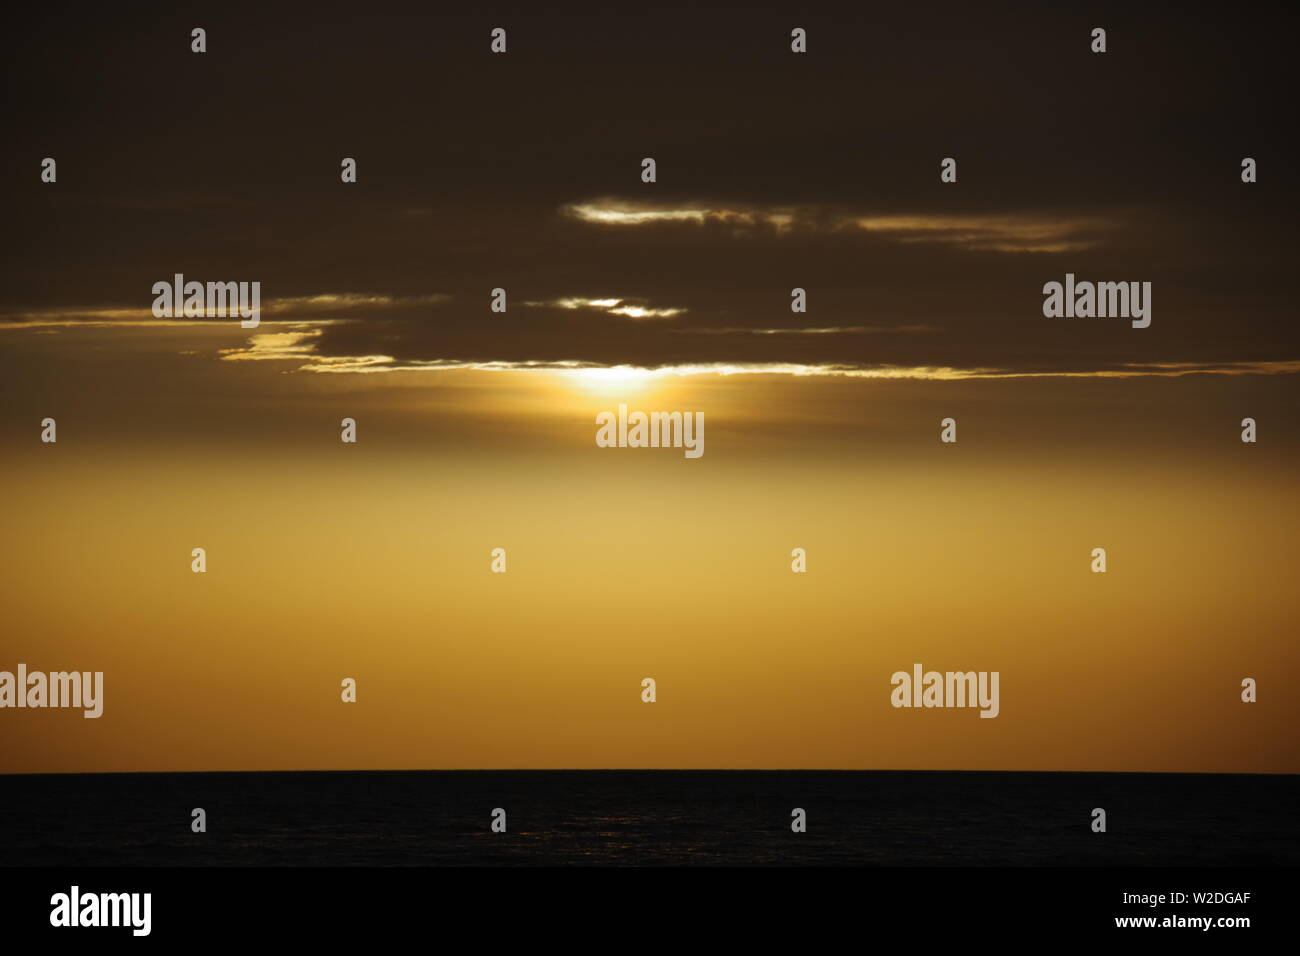 Golden Winters Sunrise with Gloomy Stratus Cloud. Aberdeen, Scotland, UK. Stock Photo